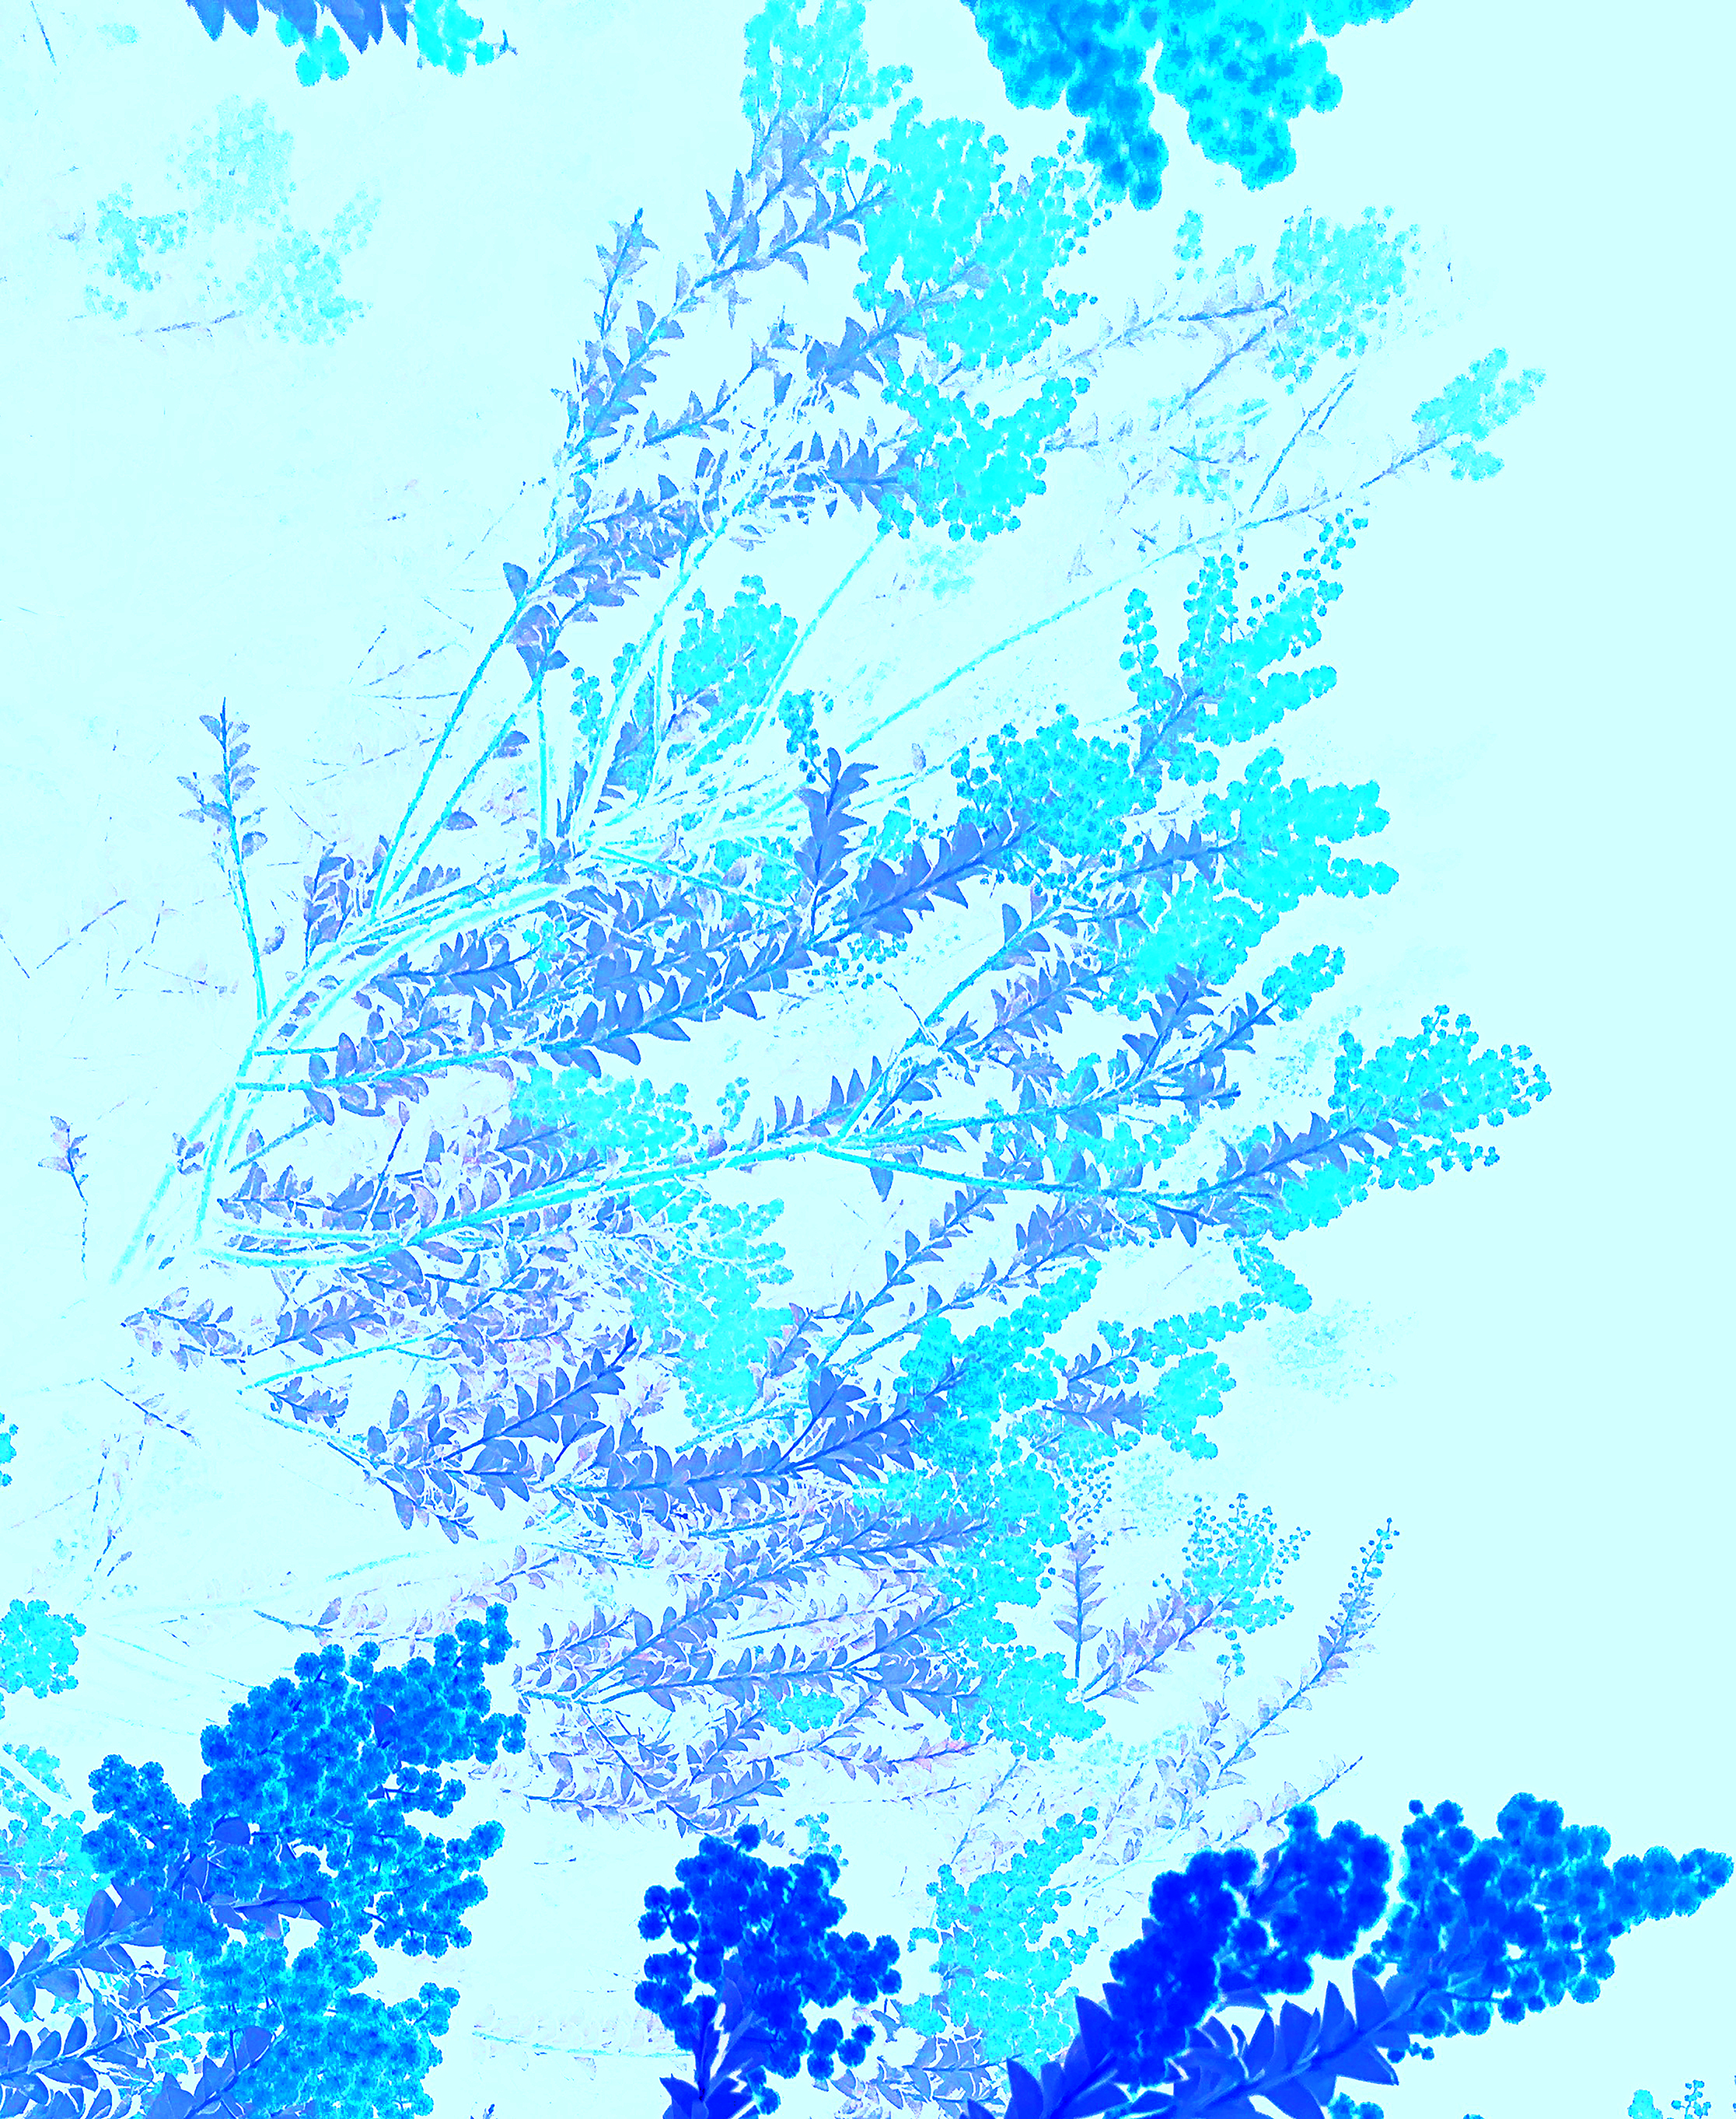 blueATNIGHT-PRESERVEDETAILS-P-IMG_5561web.jpg